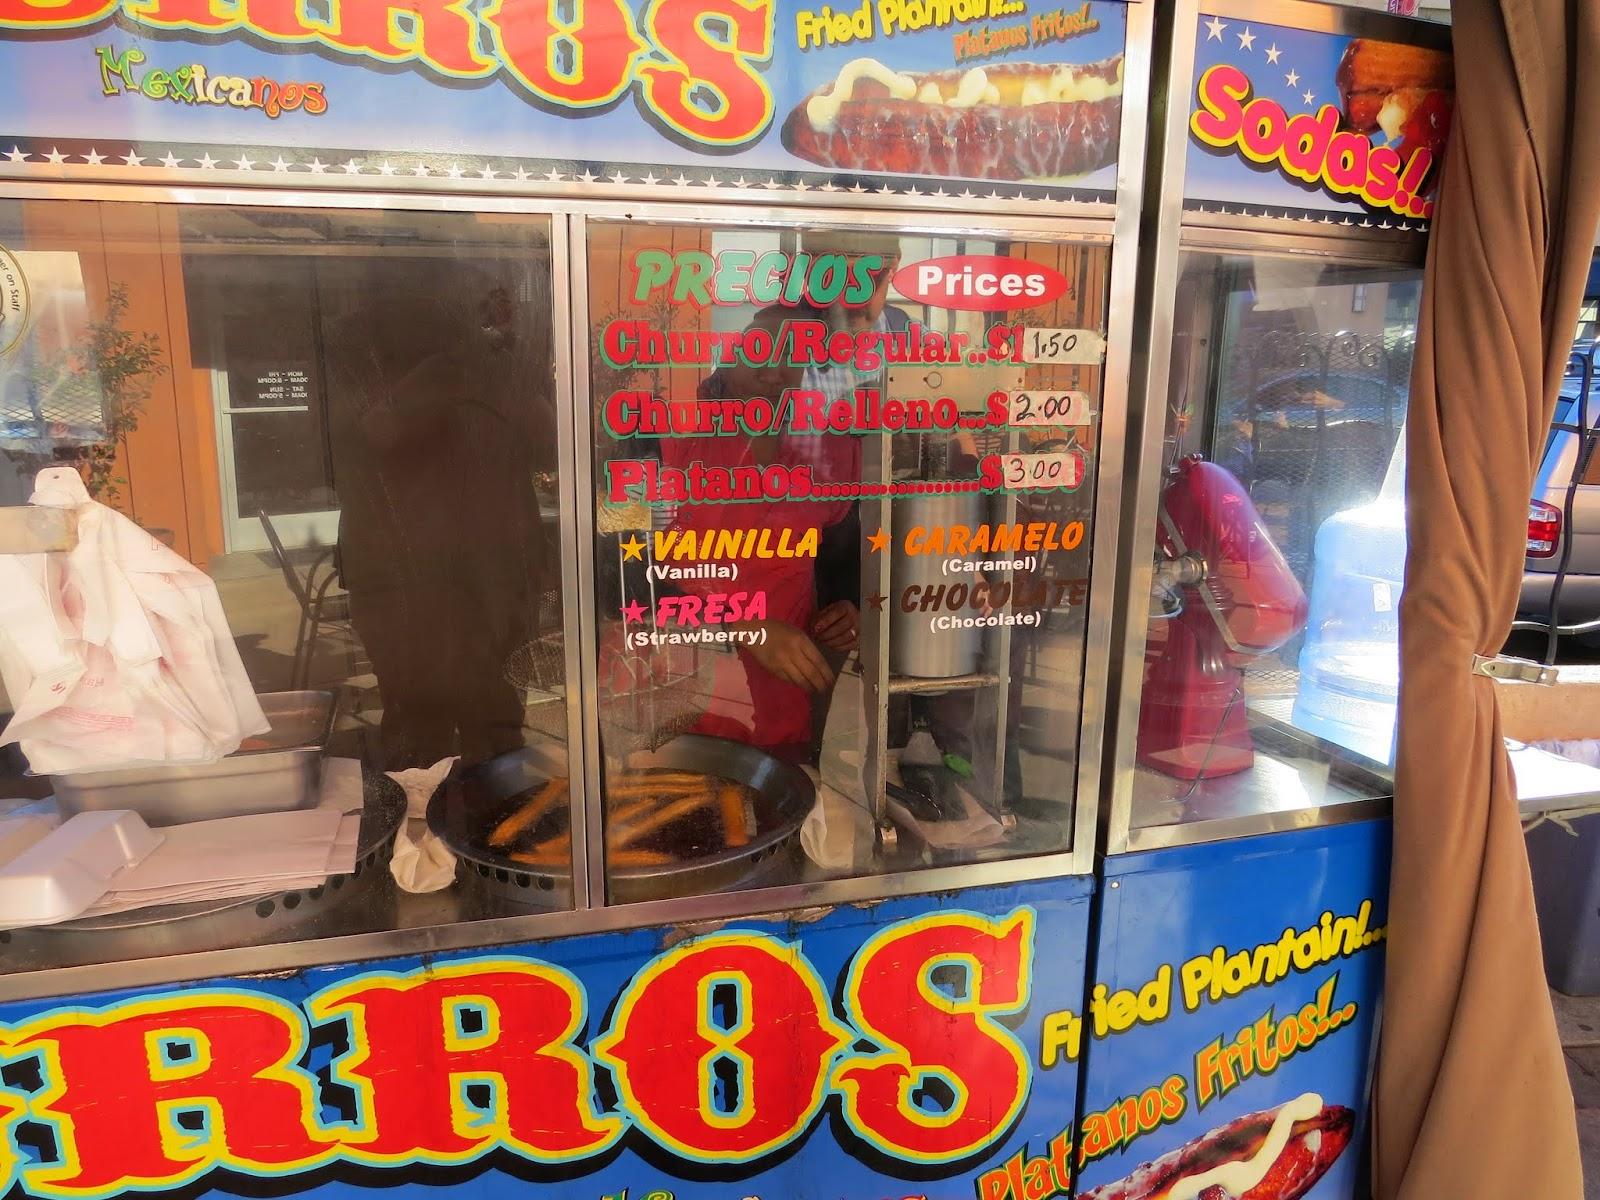 Churro Menu at Fruitvale Public Market